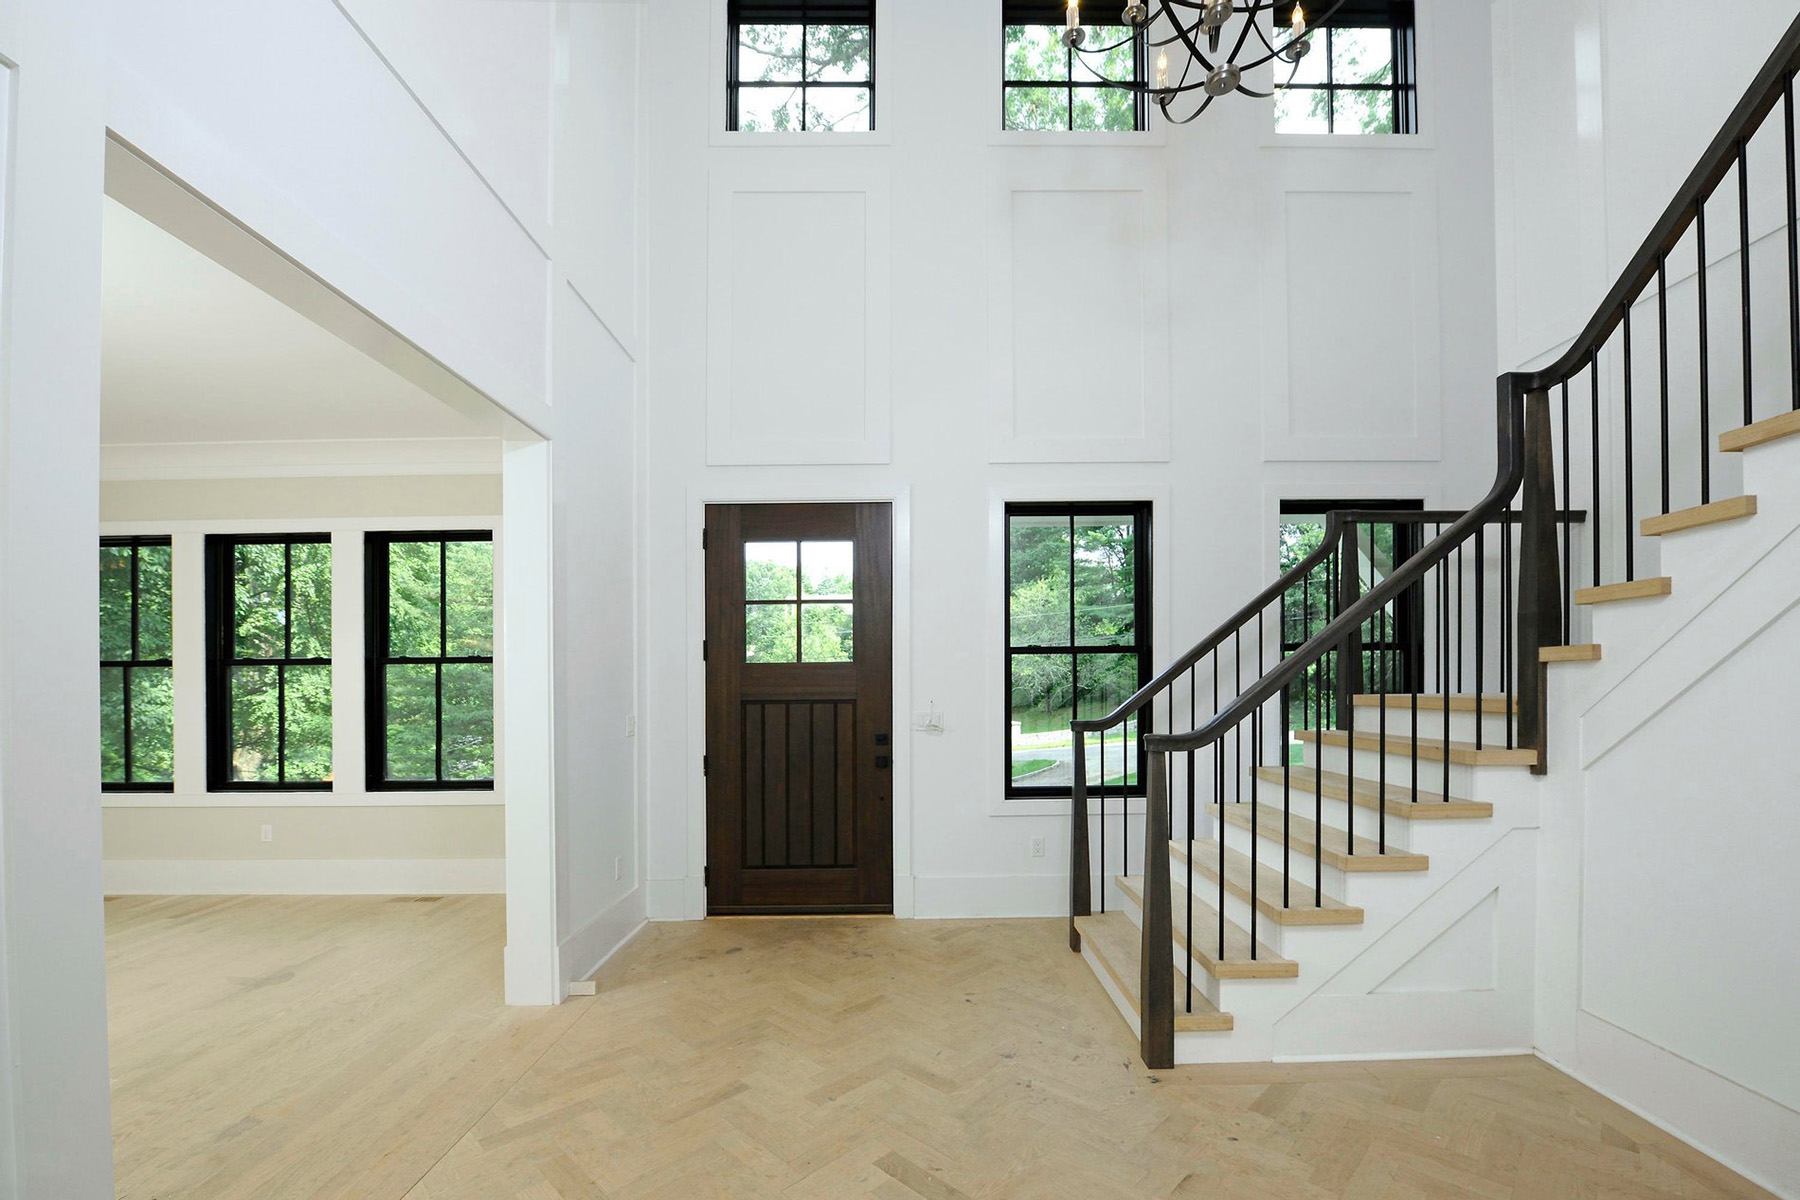 Transitional home with black windows & herringbone wood floors.